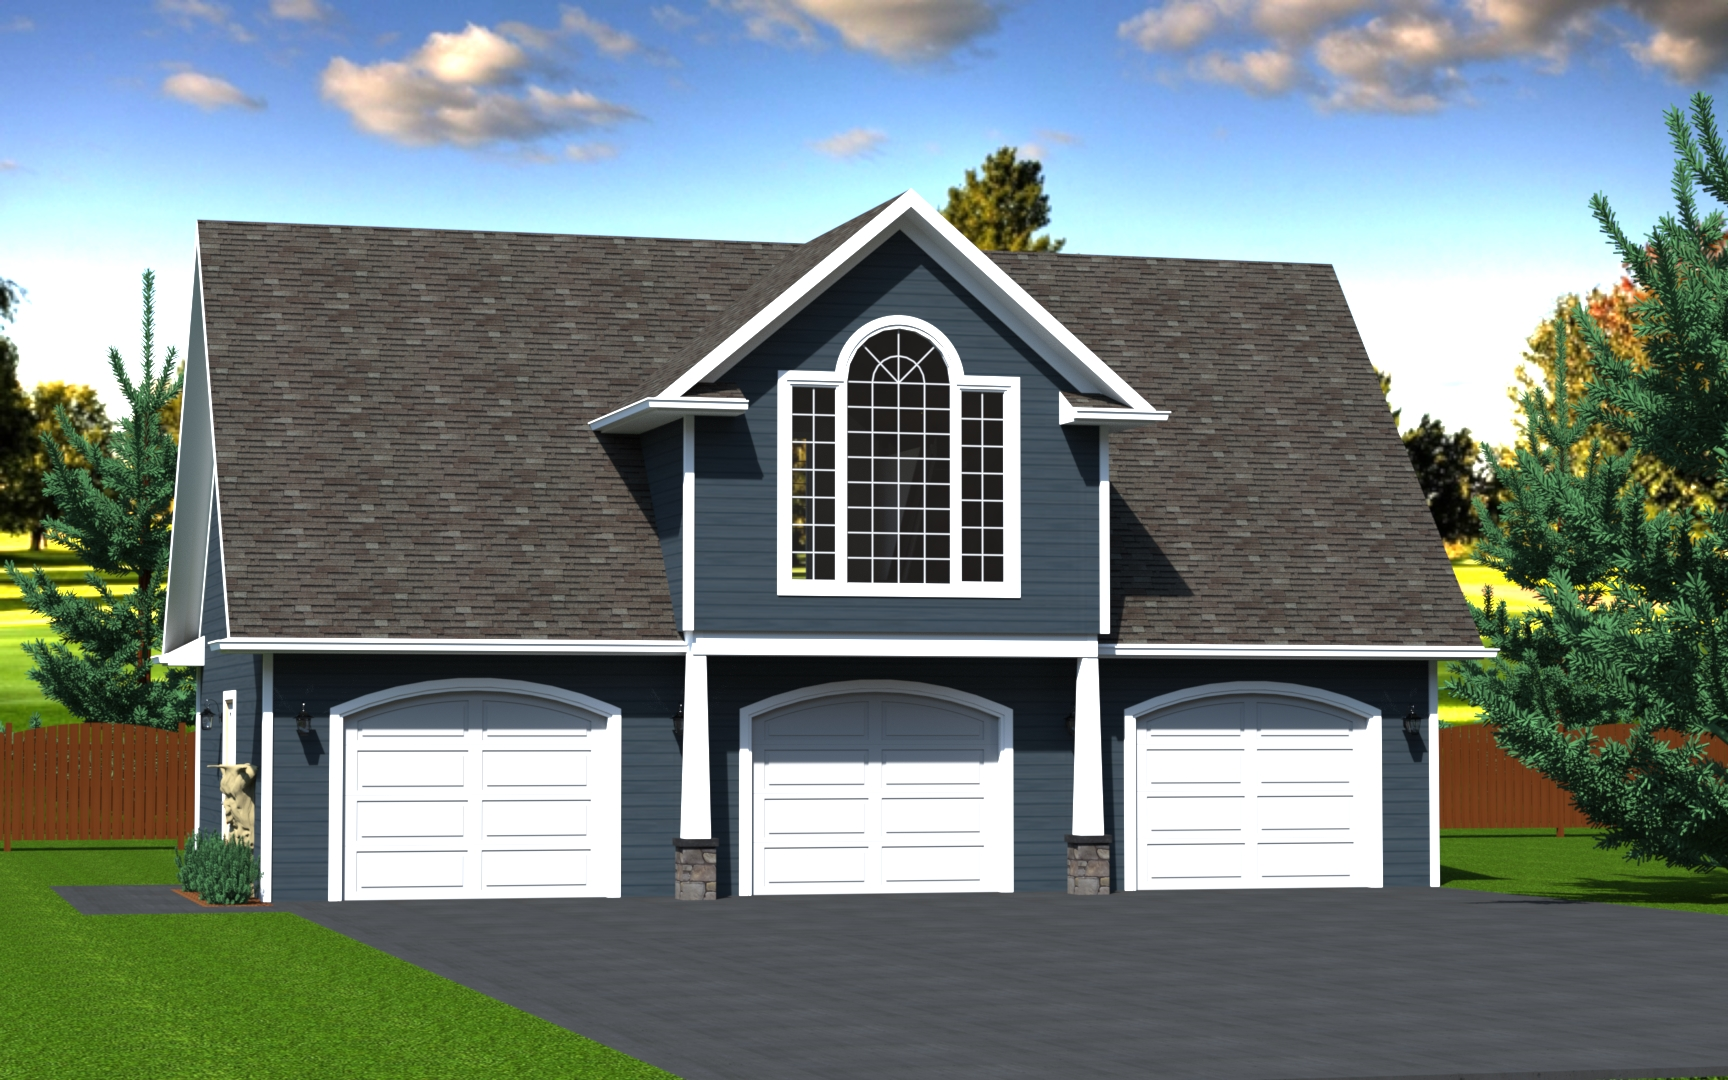 1008 sq.ft. timber mart 3 car garage exterior render